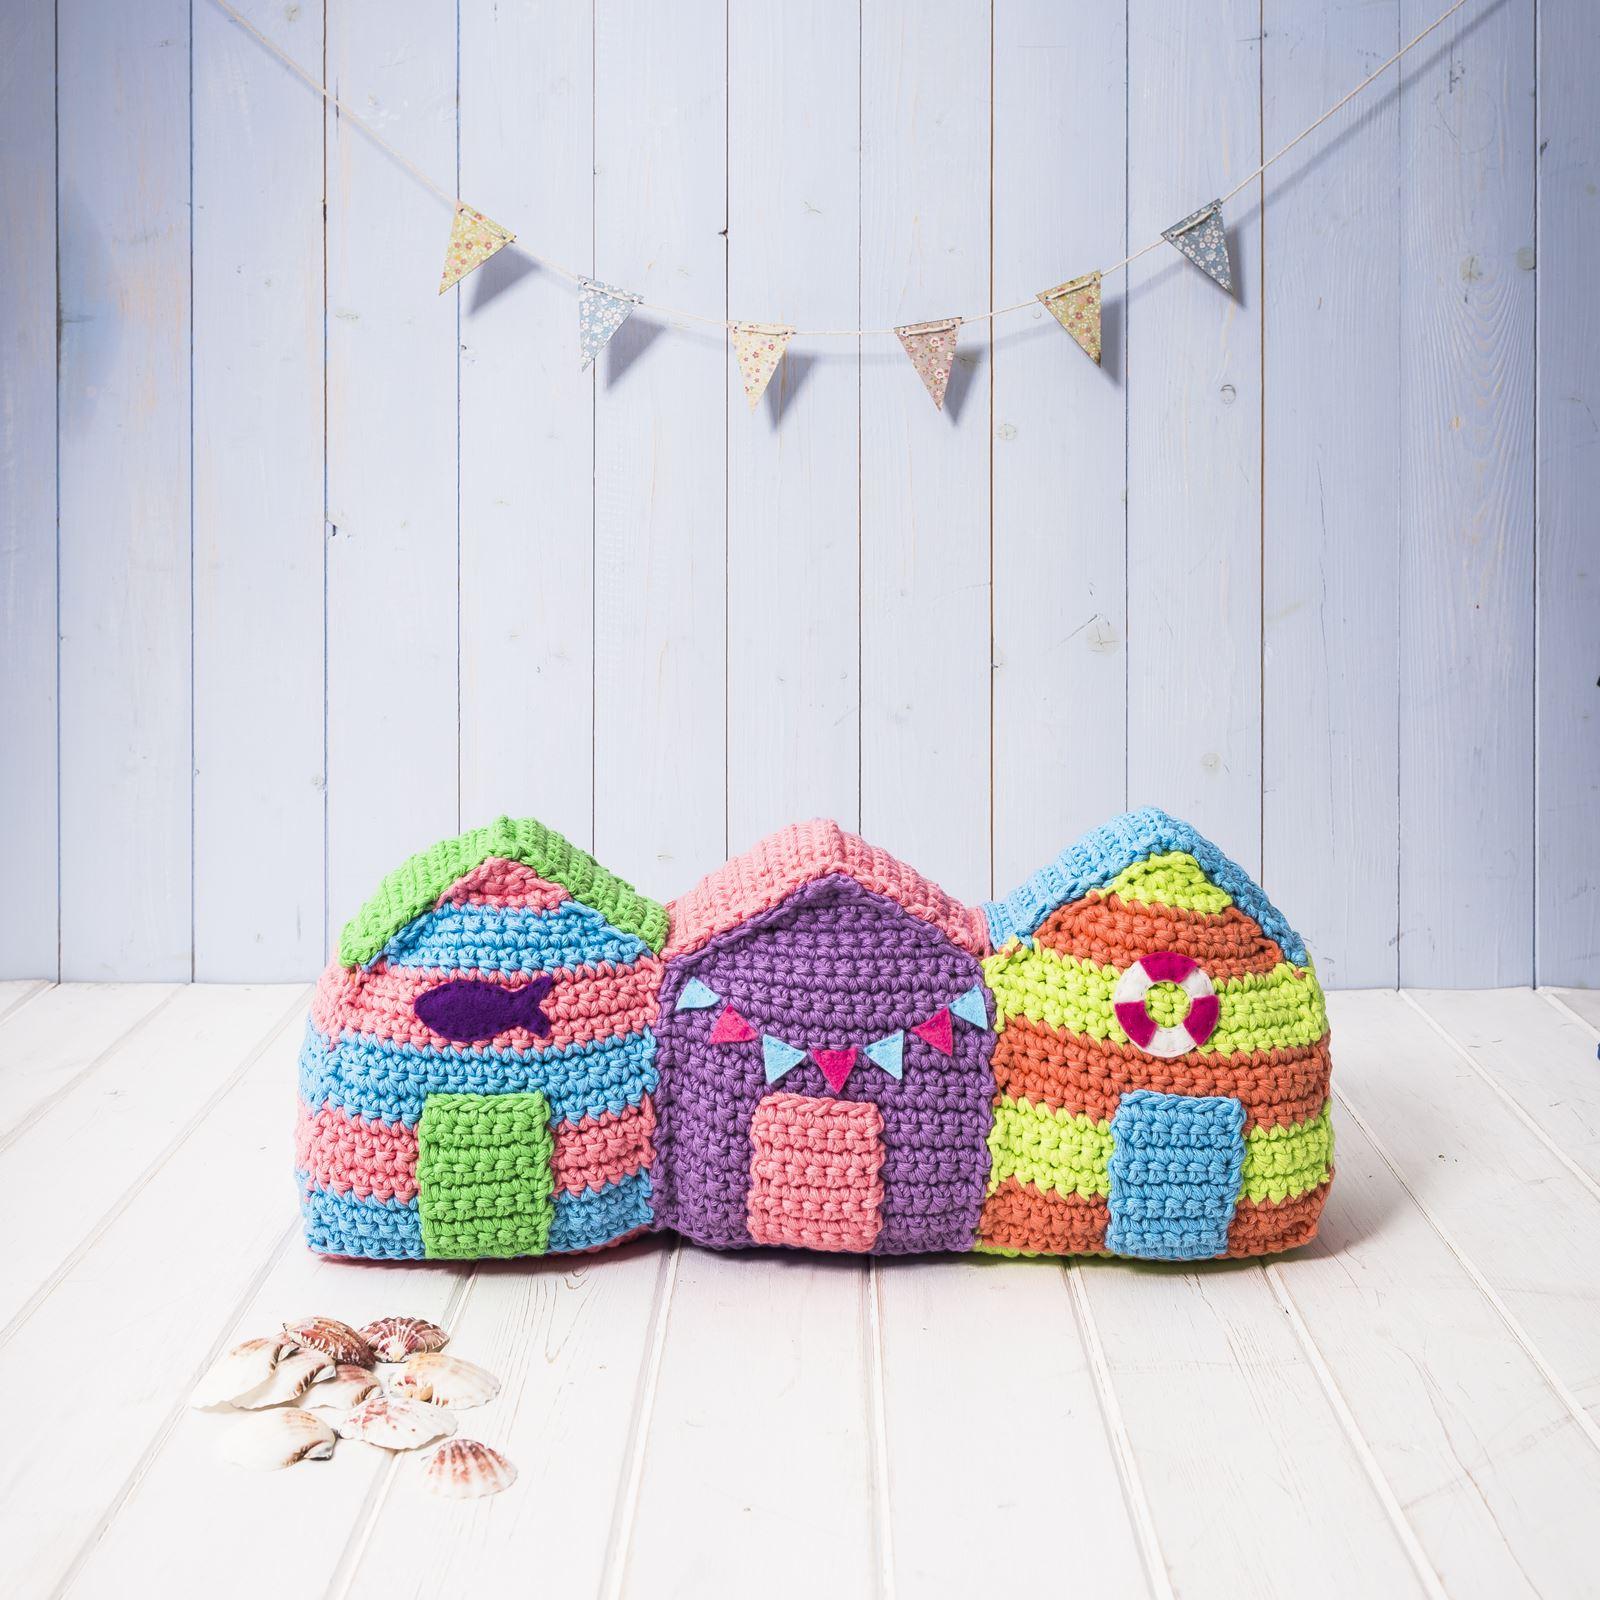 DMC Natura XL Yummy Crochet Patterns Amigurumi Home Decor | eBay